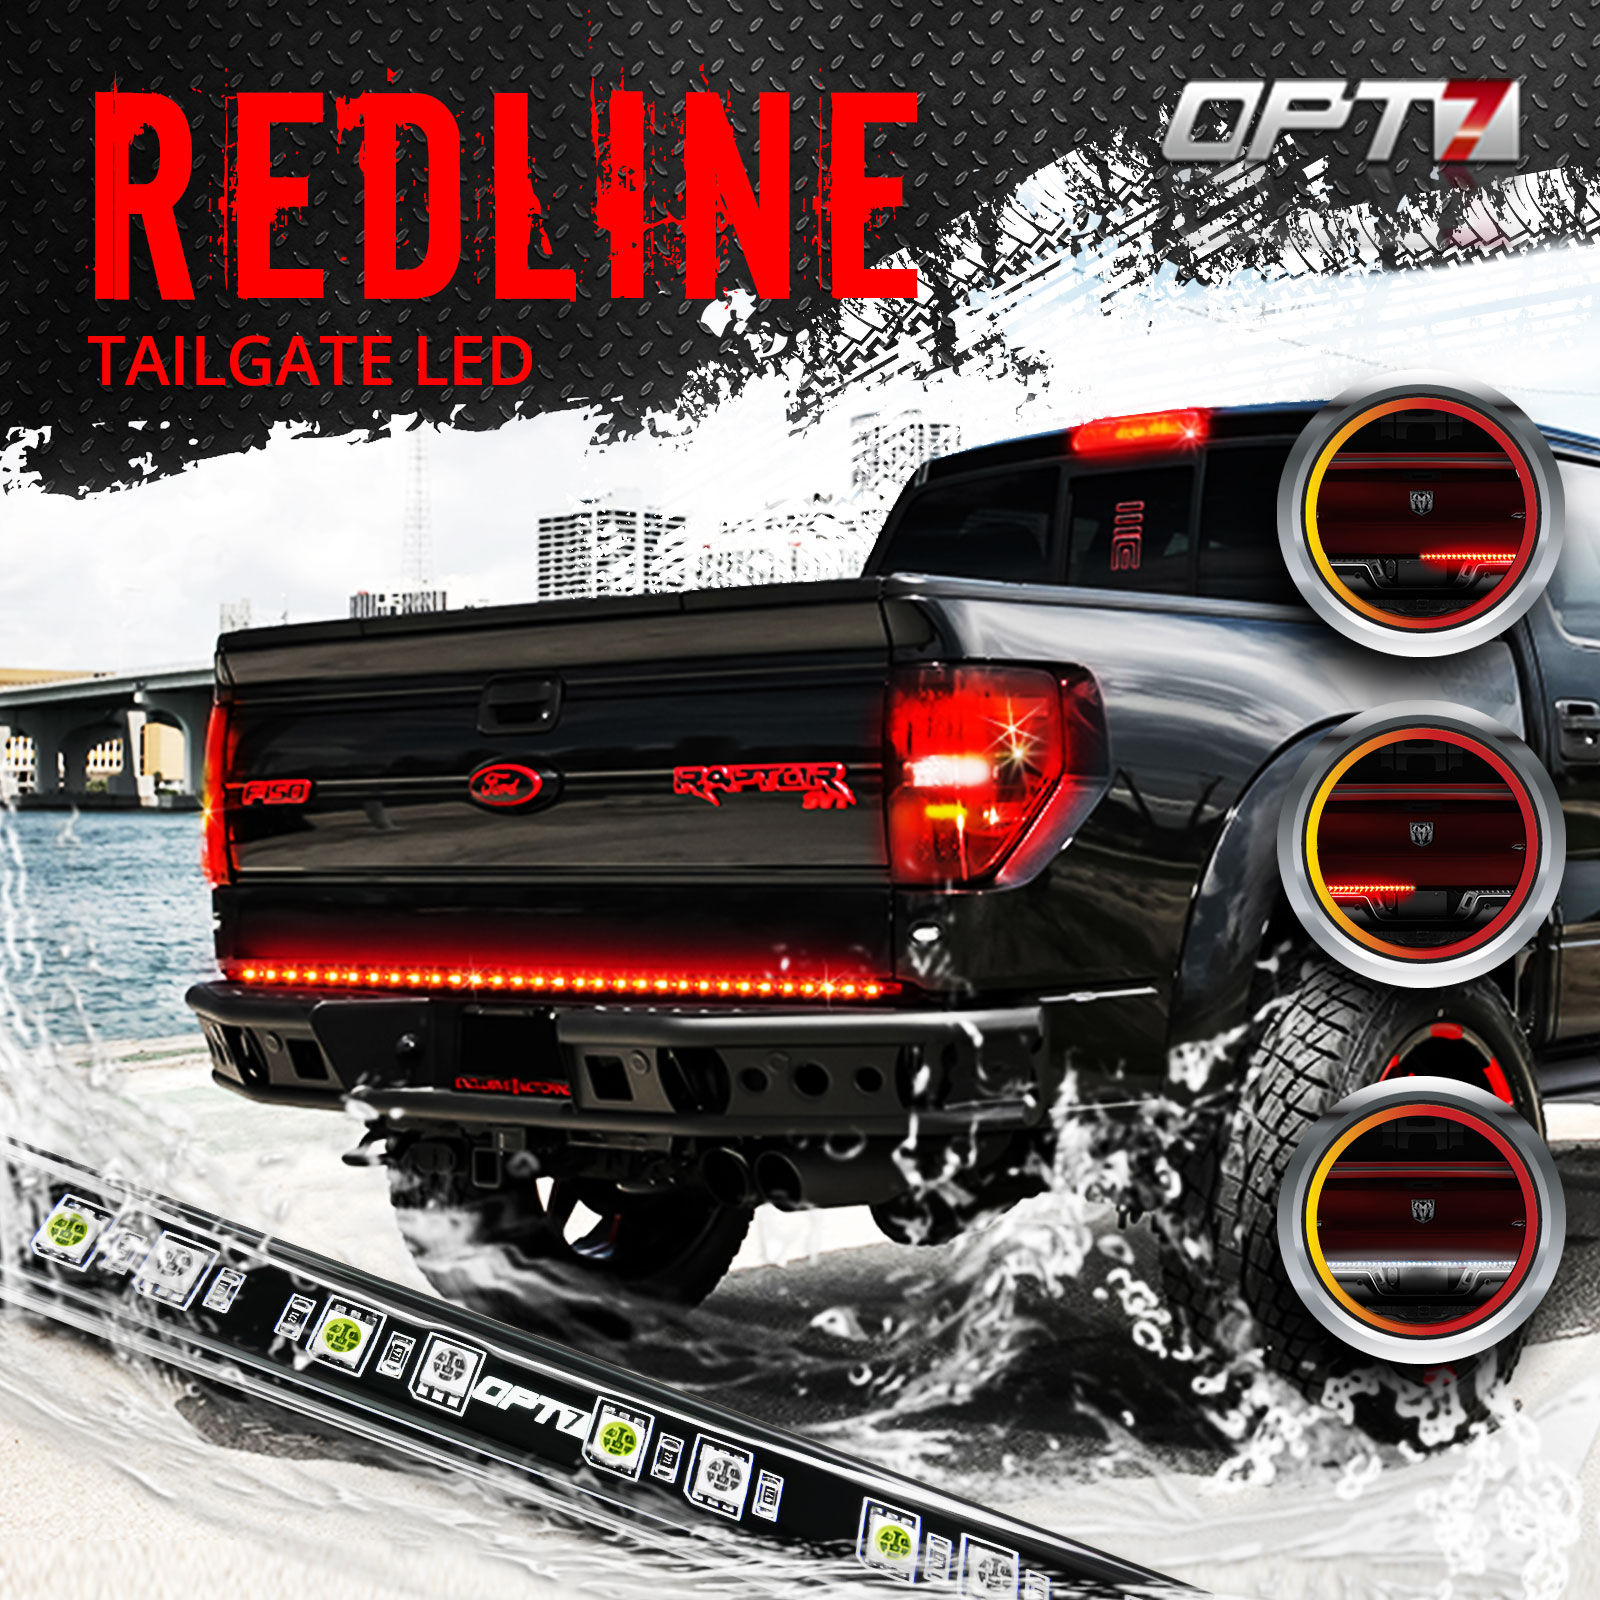 60 redline led tailgate light bar tri core led weatherproof led light circuit diagram opt 7 led light bar wiring diagram for truck [ 1600 x 1600 Pixel ]